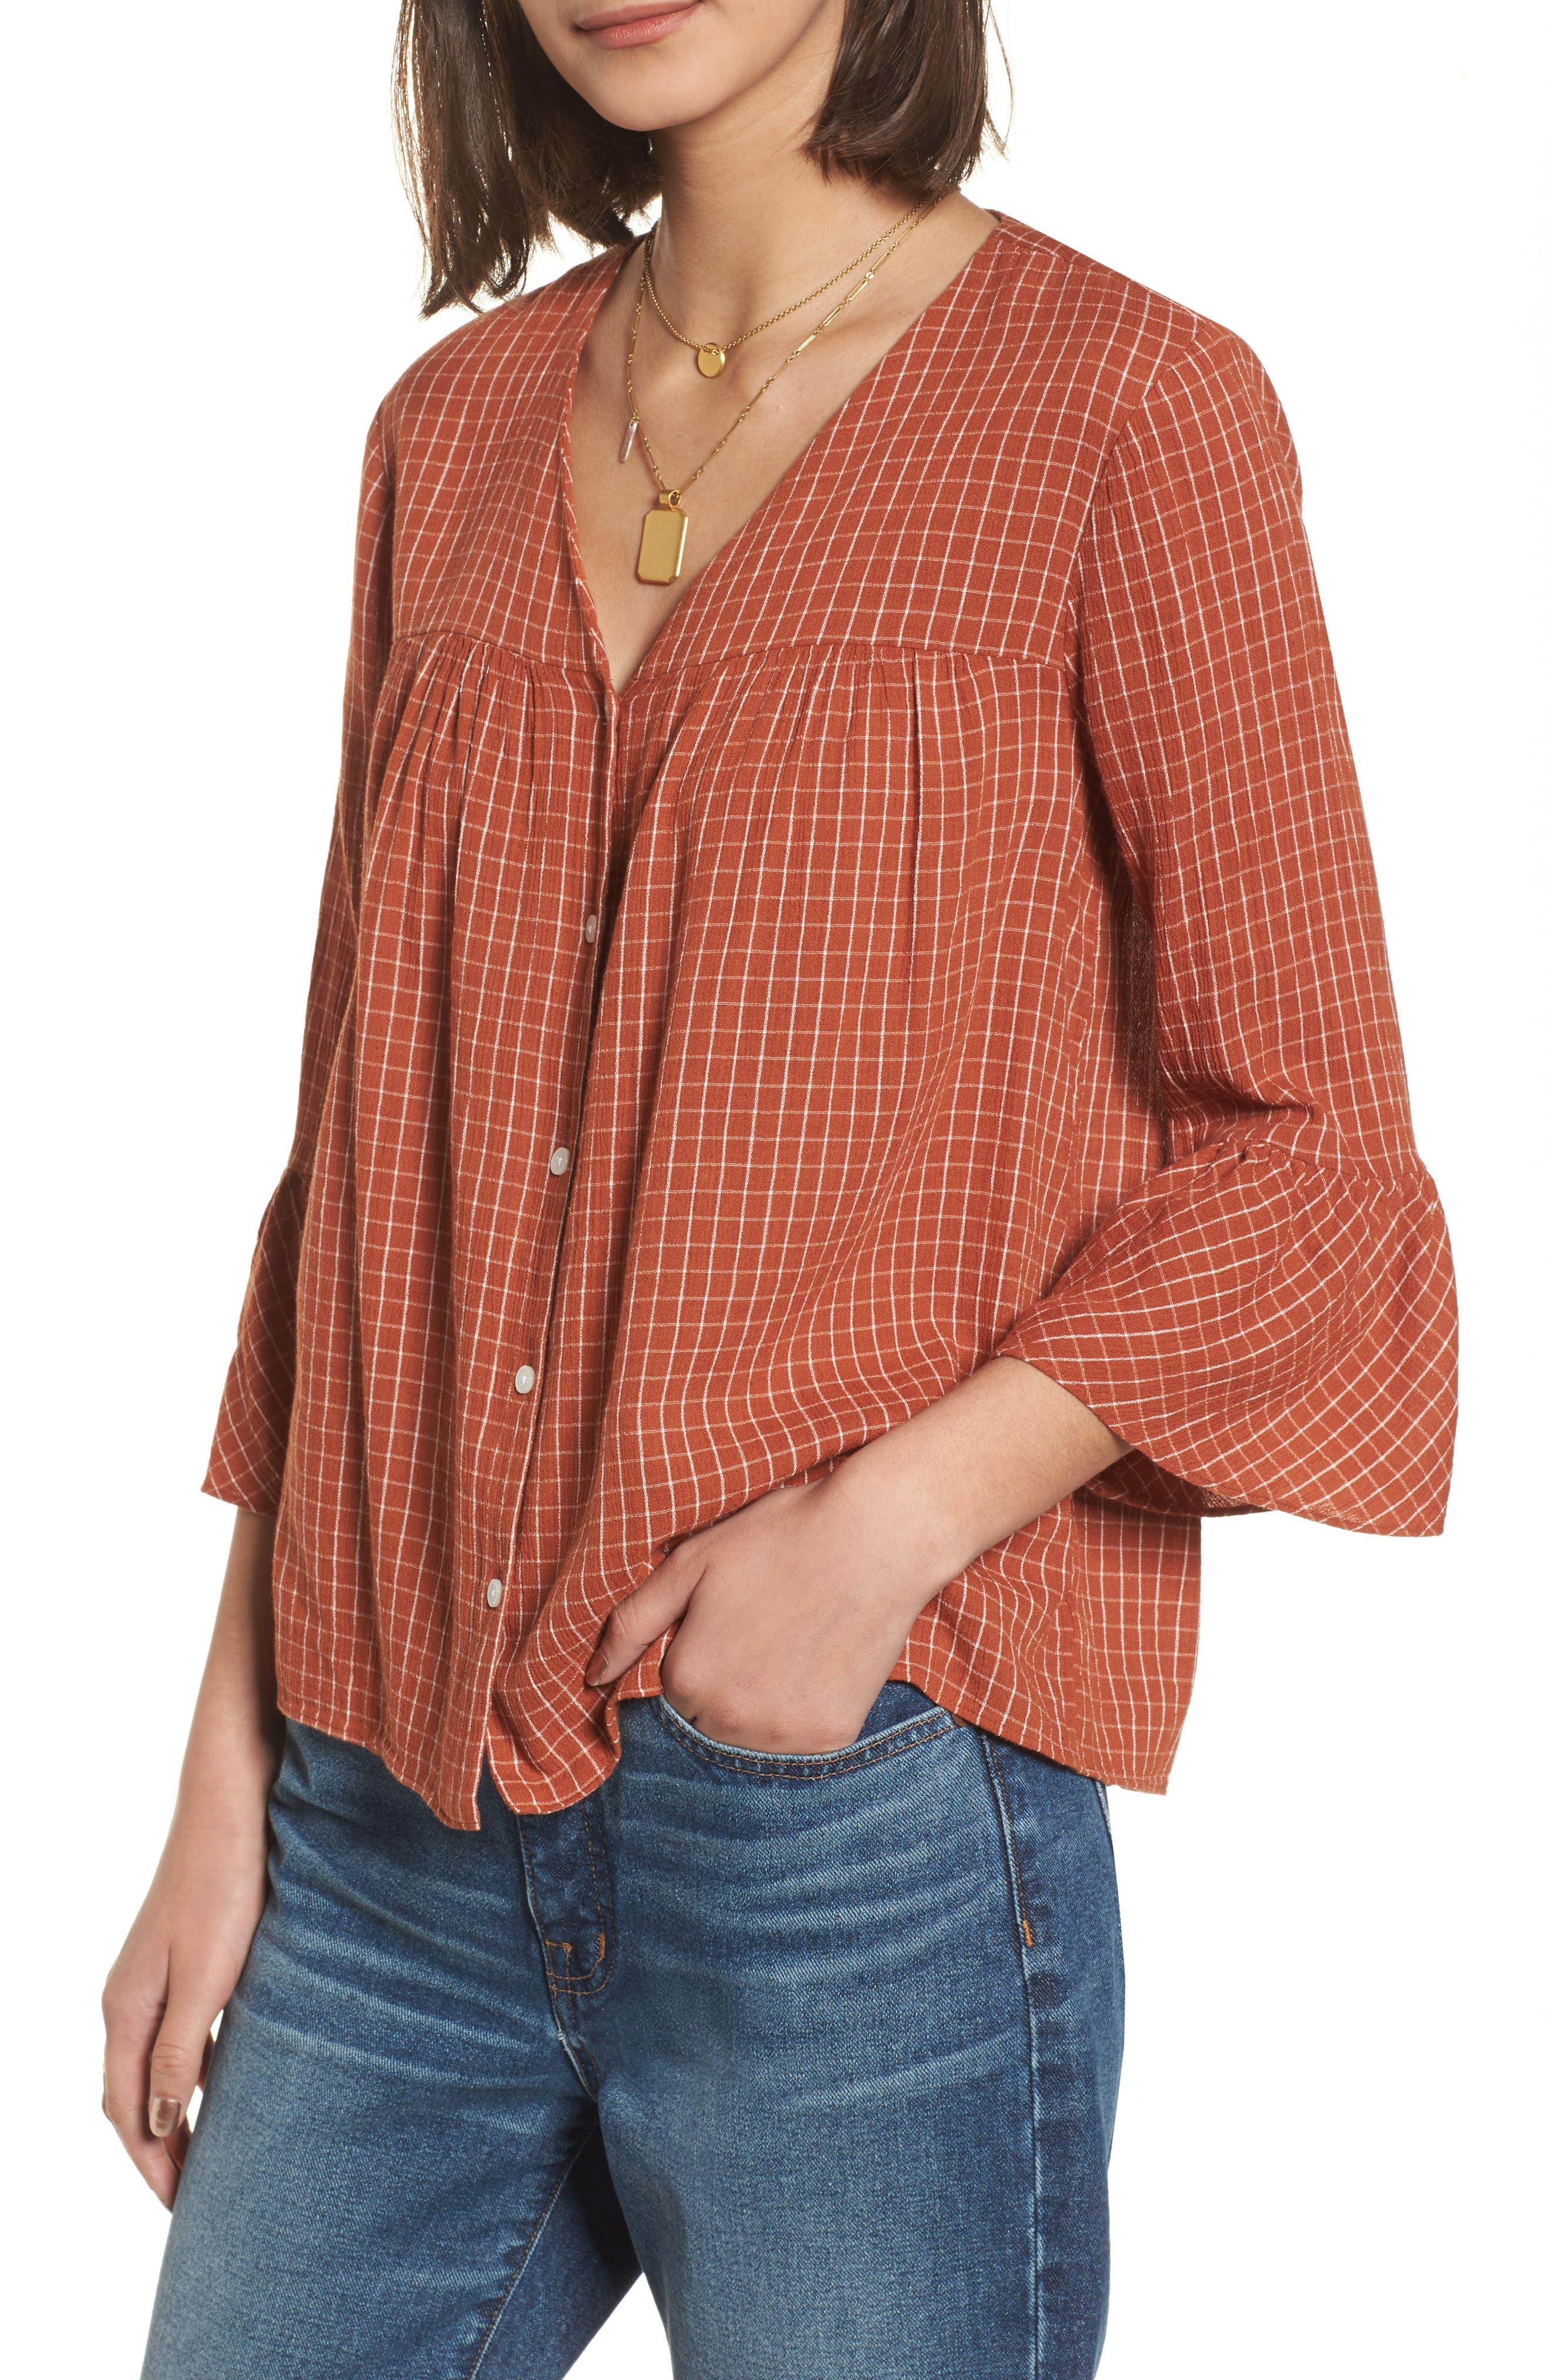 Veranda Bell Sleeve Shirt,                         Main,                         color, Warm Nutmeg